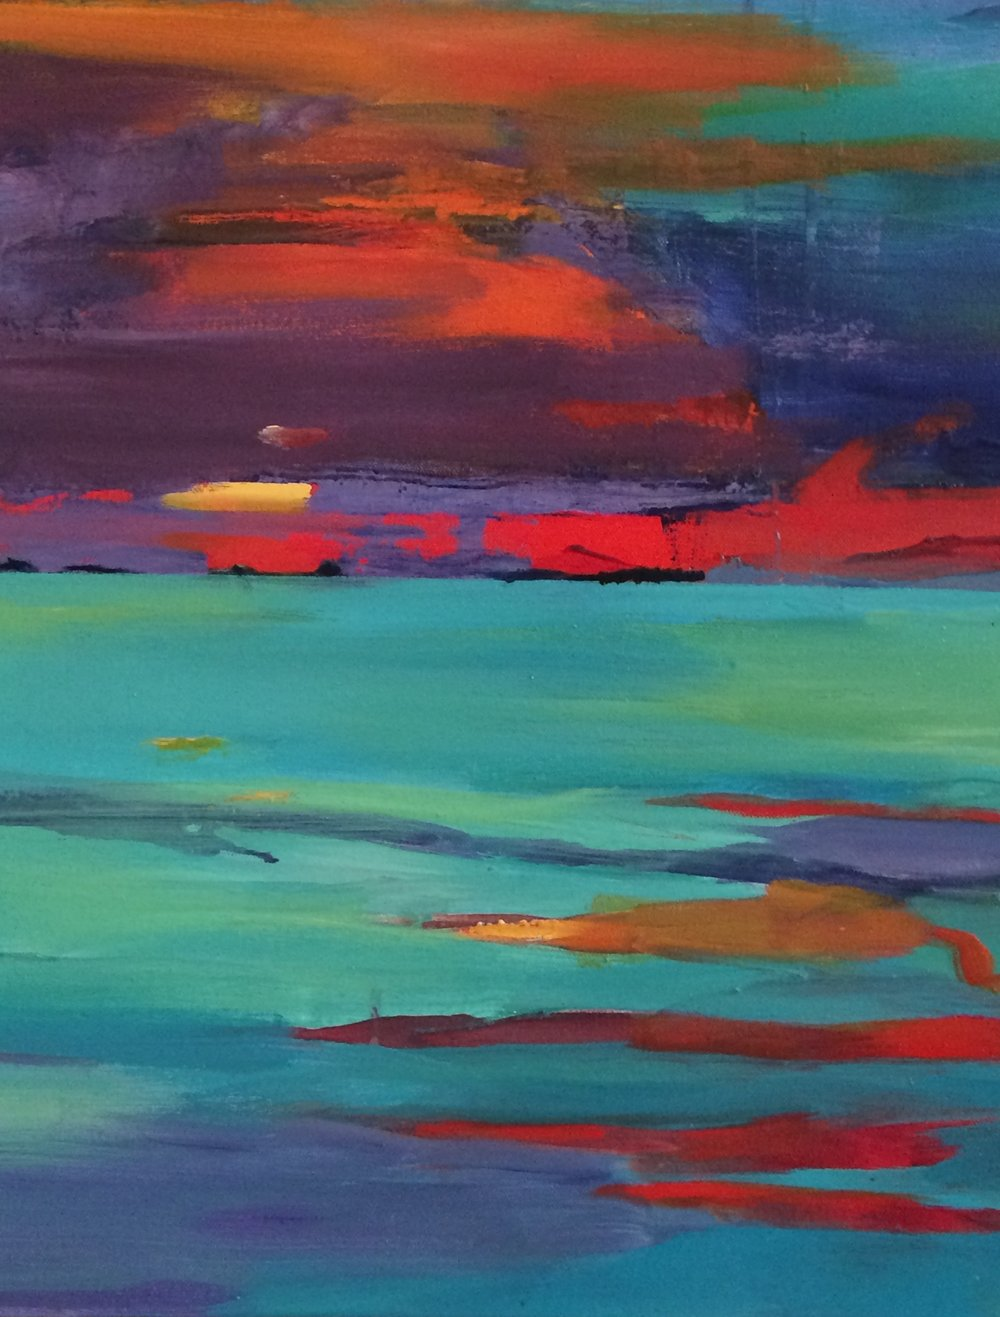 """ Island Sunset"" 24"" x 20"" acrylic on canvas $300"